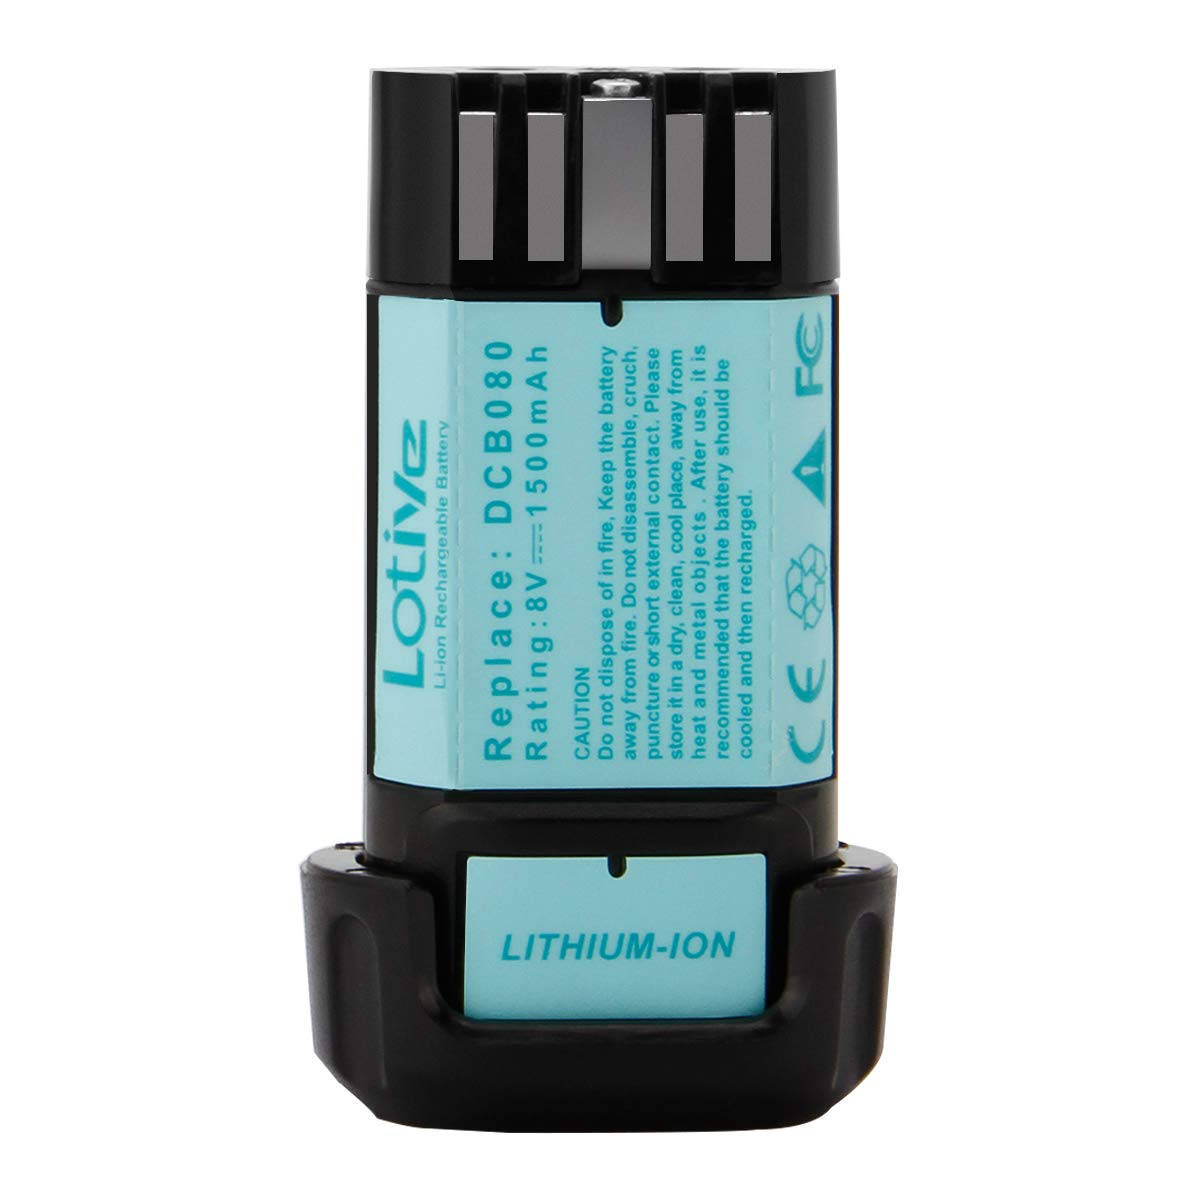 Lotive 1500mAh Battery Compatible With DEWALT DCB080 8-Volt MAX Li-ion Cordless Drill Tool Battery